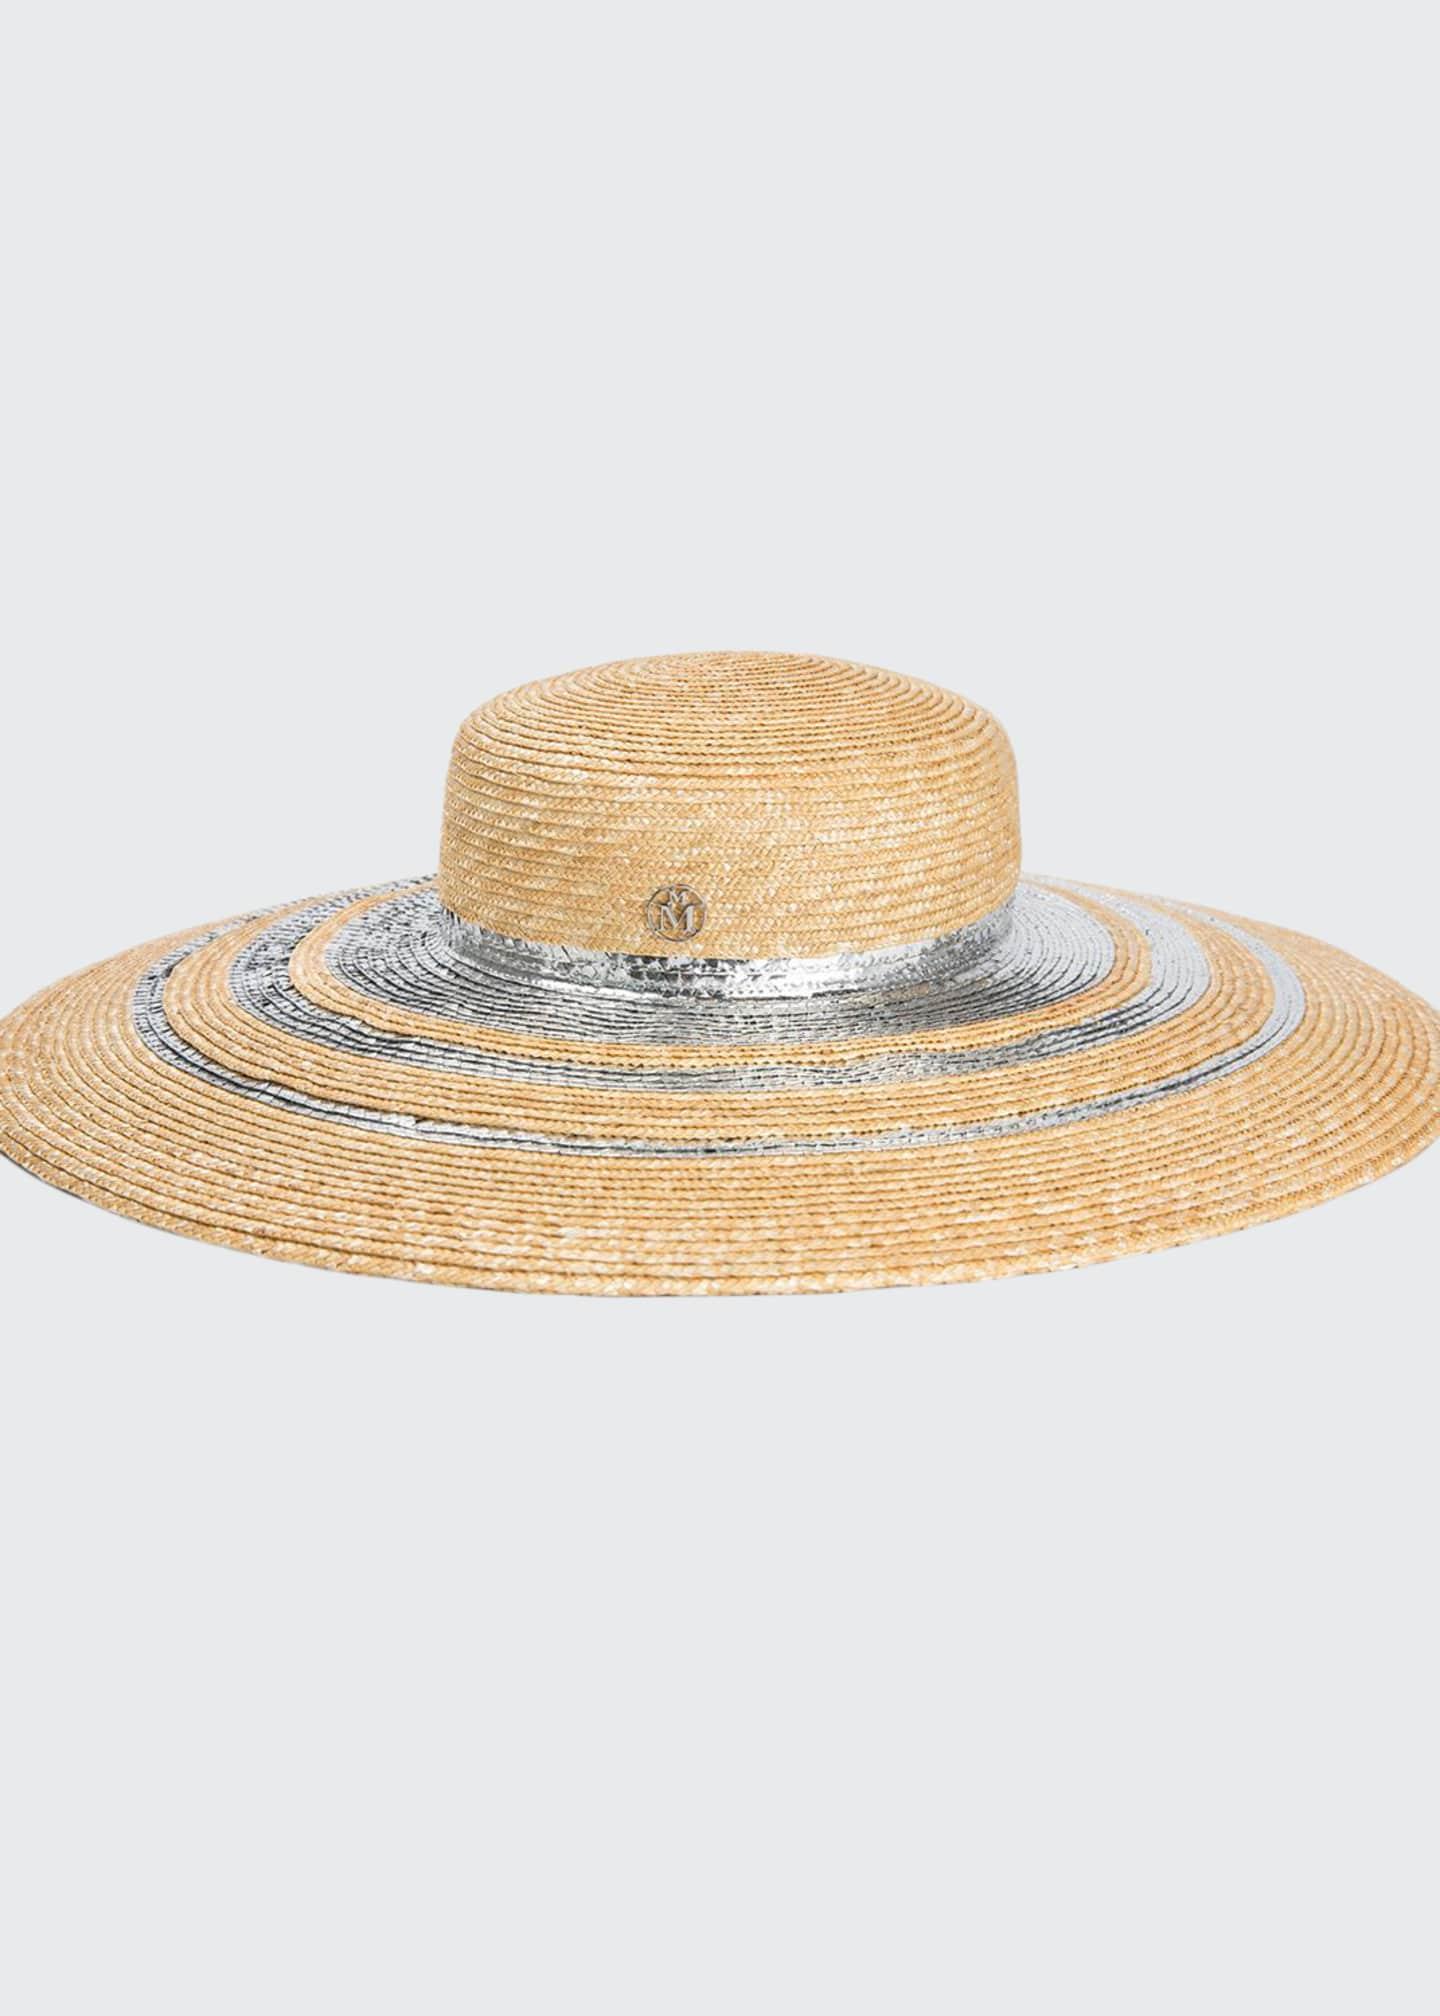 Maison Michel Bianca Metallic Trim Sun Hat